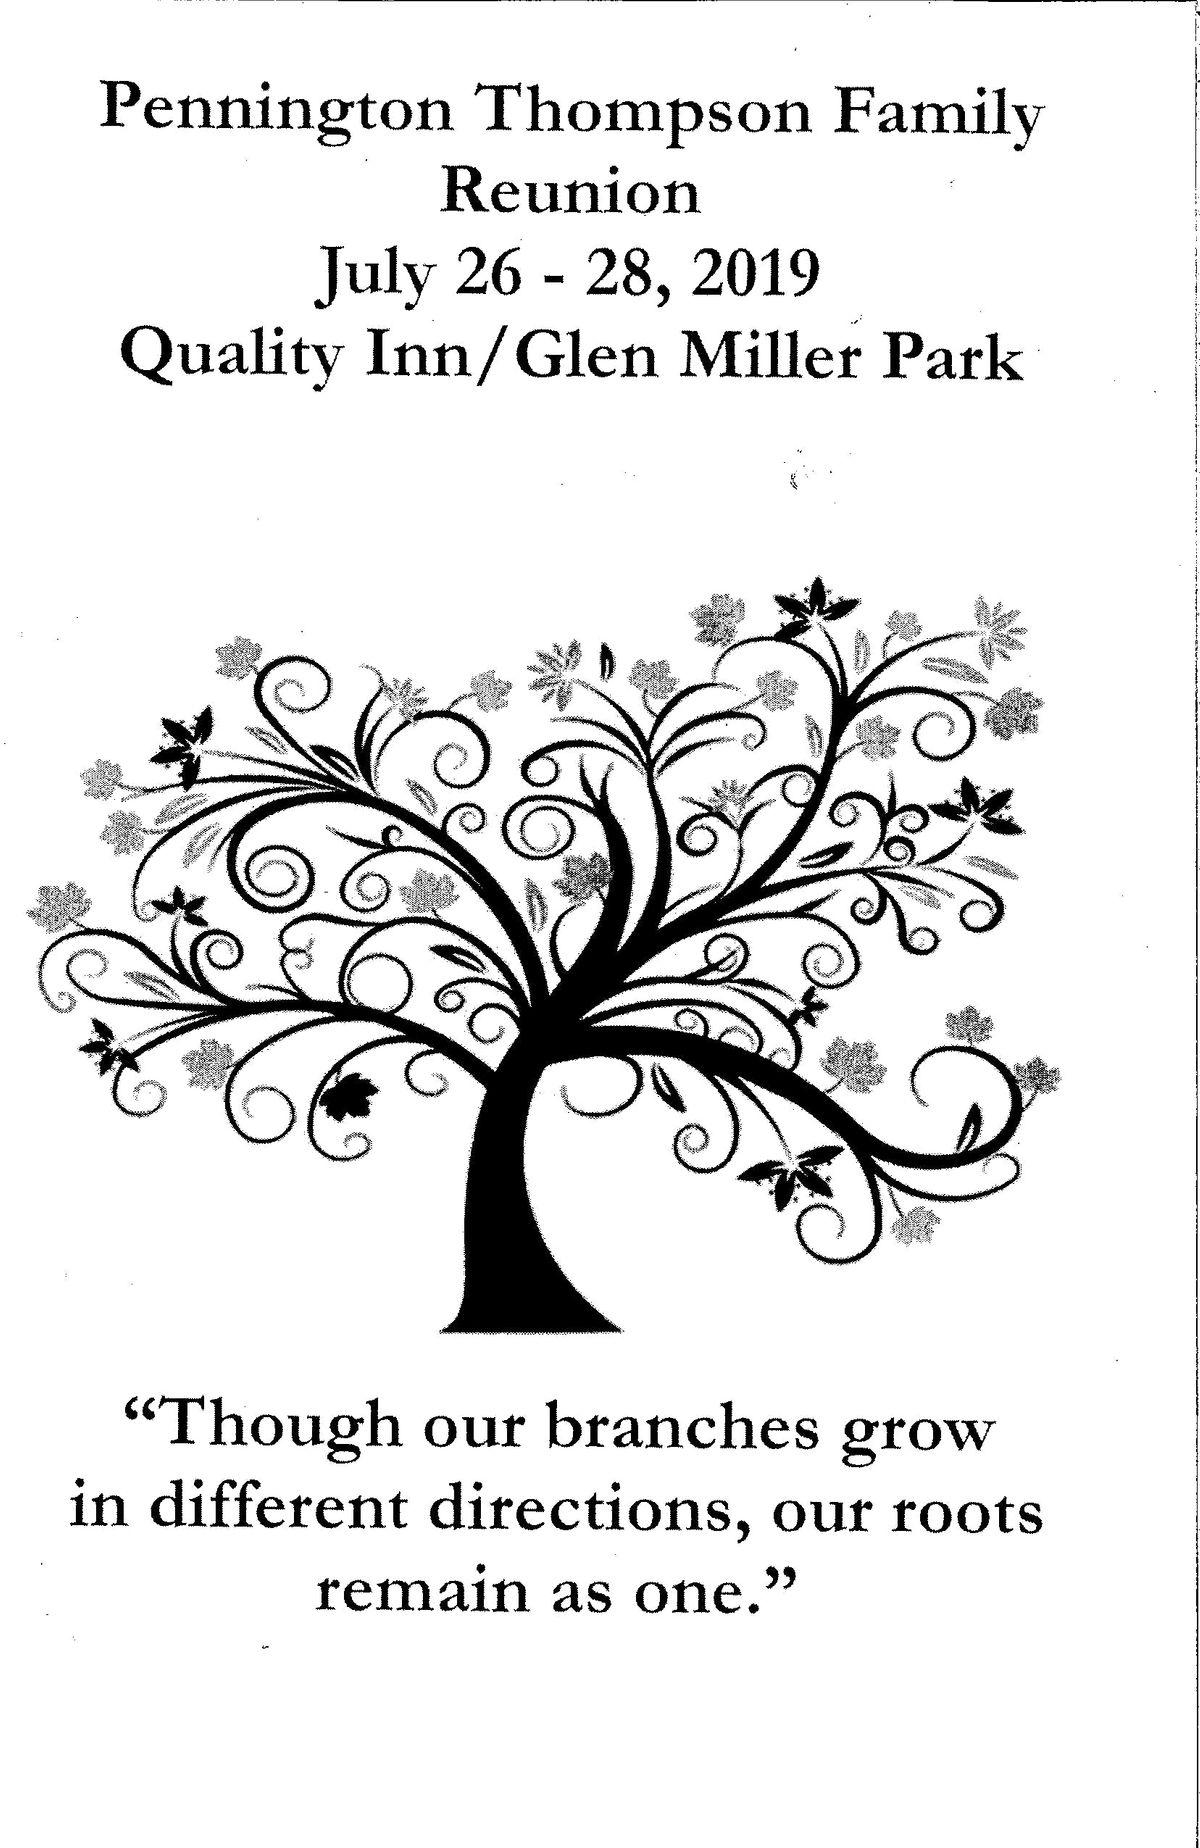 Pennington-Thompson Family Reunion at Quality Inn and